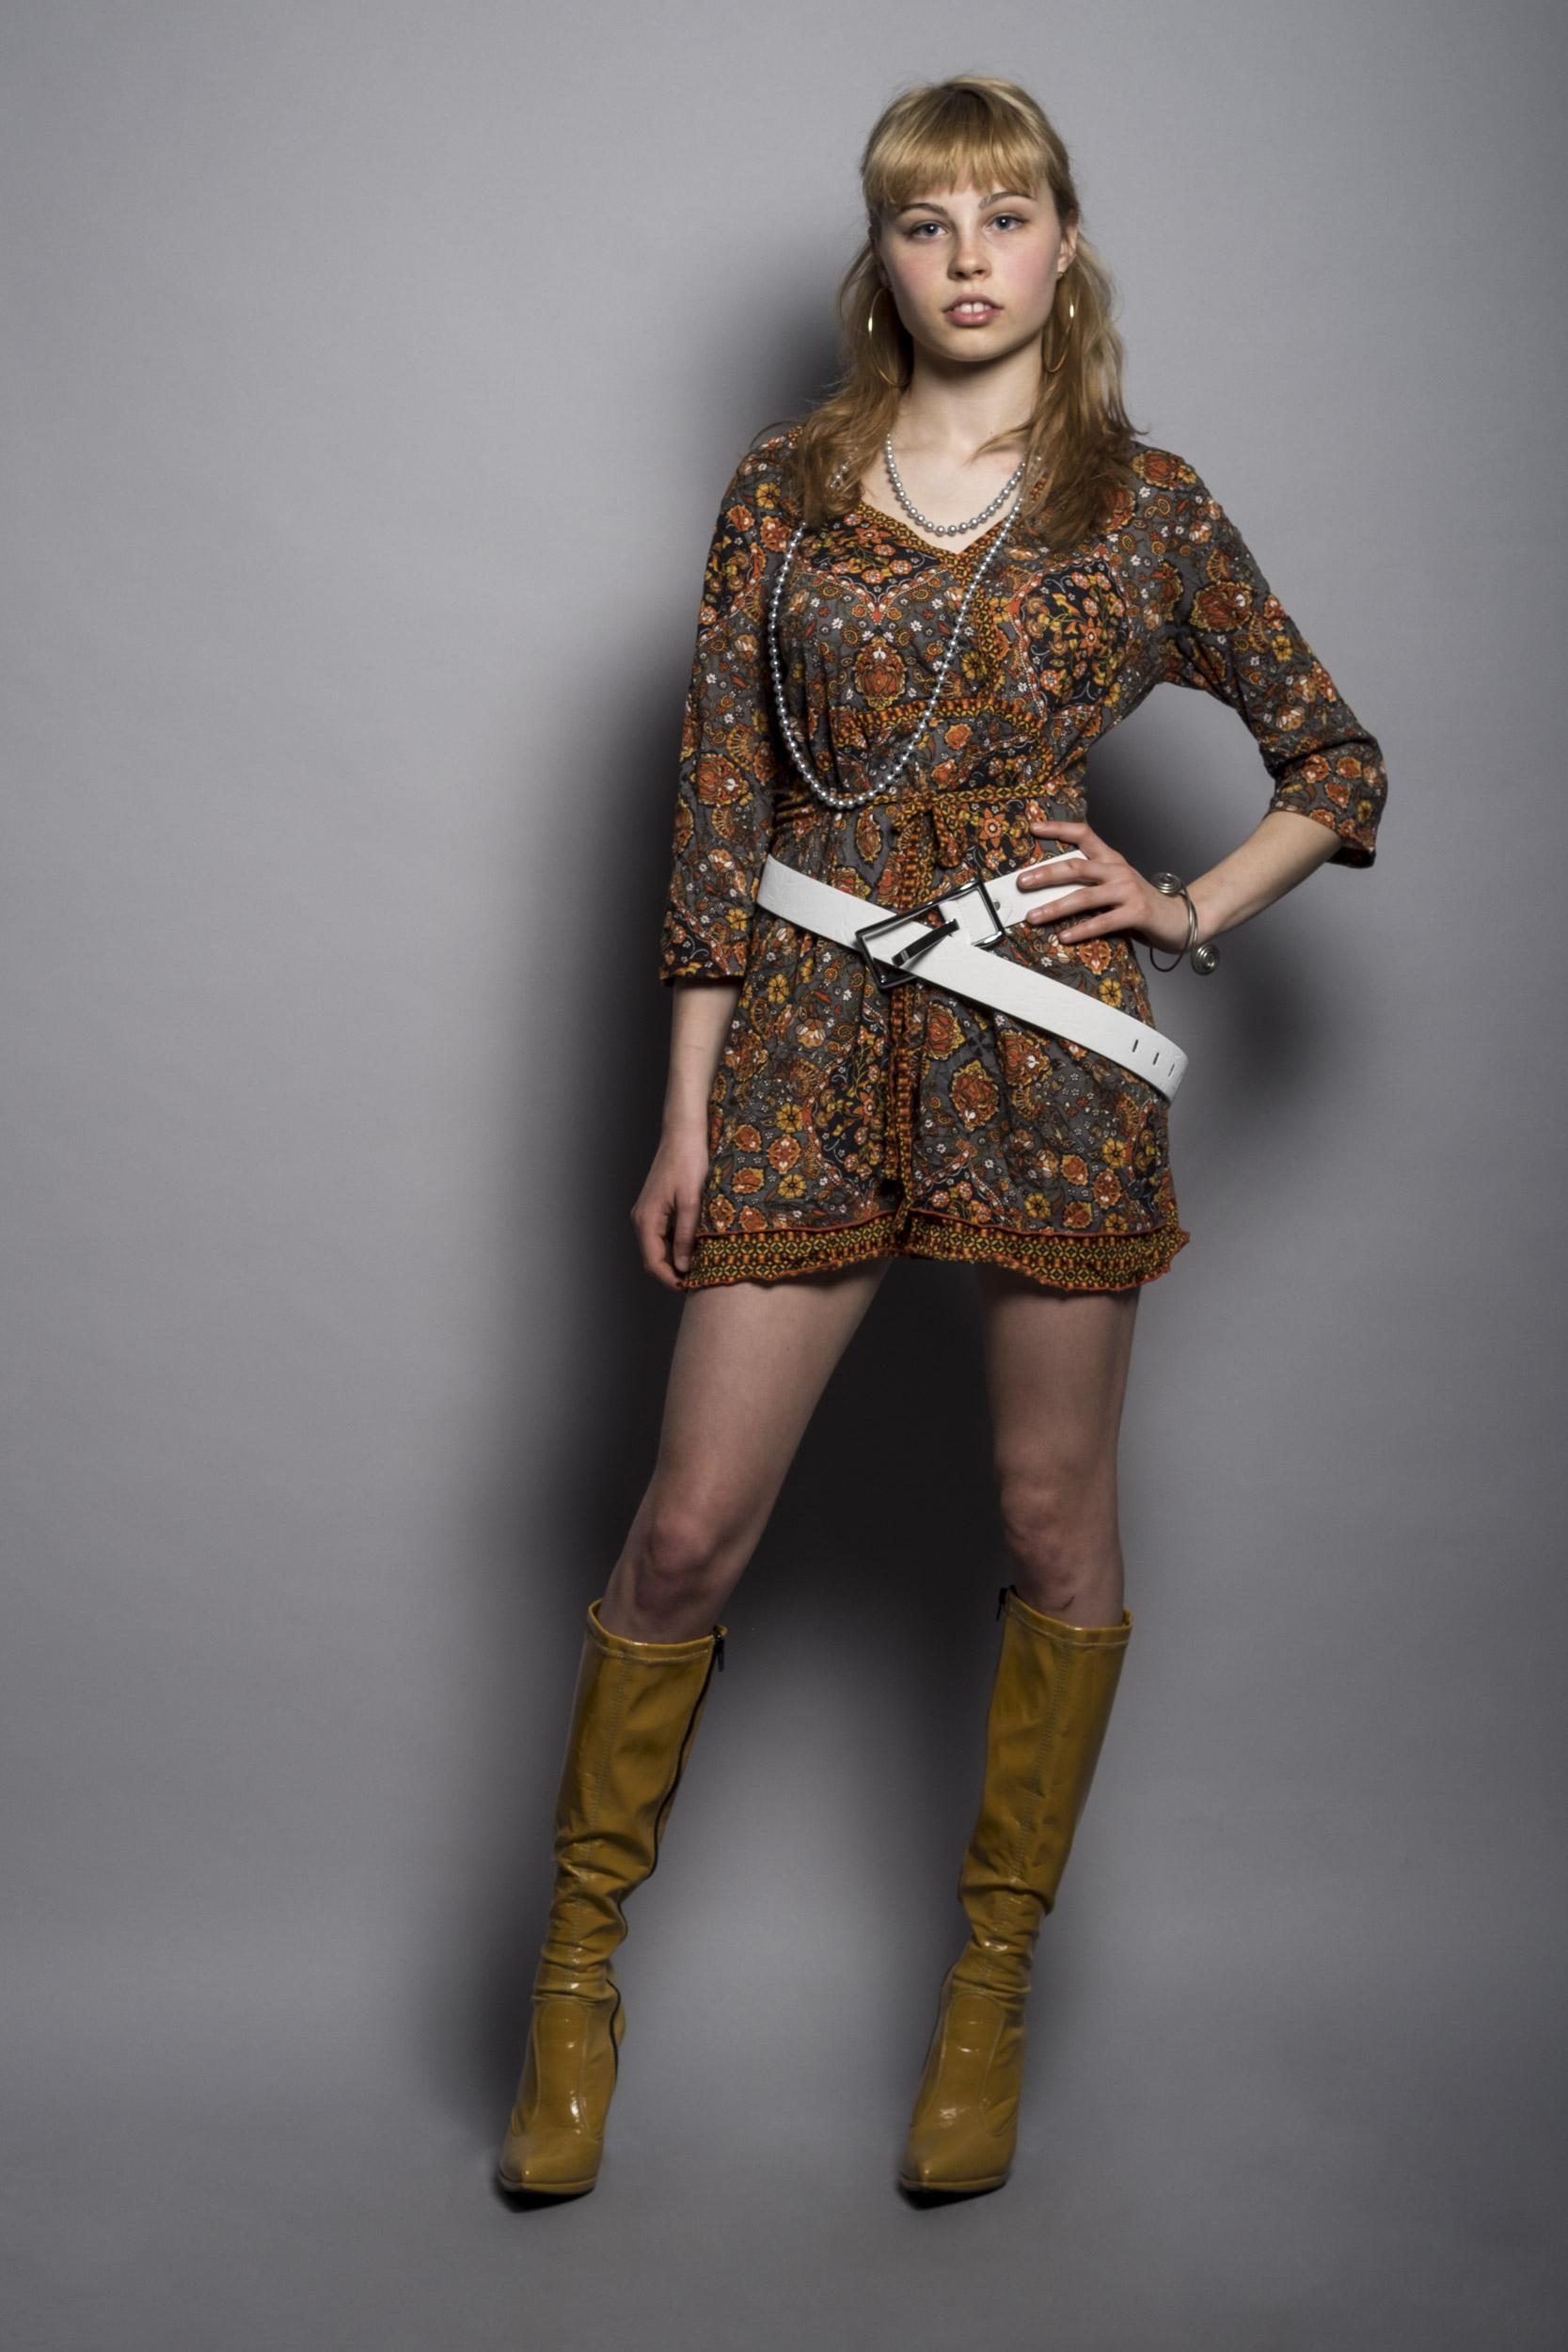 Vivien-Creative-Models-Agenzia-Modelle-Brescia